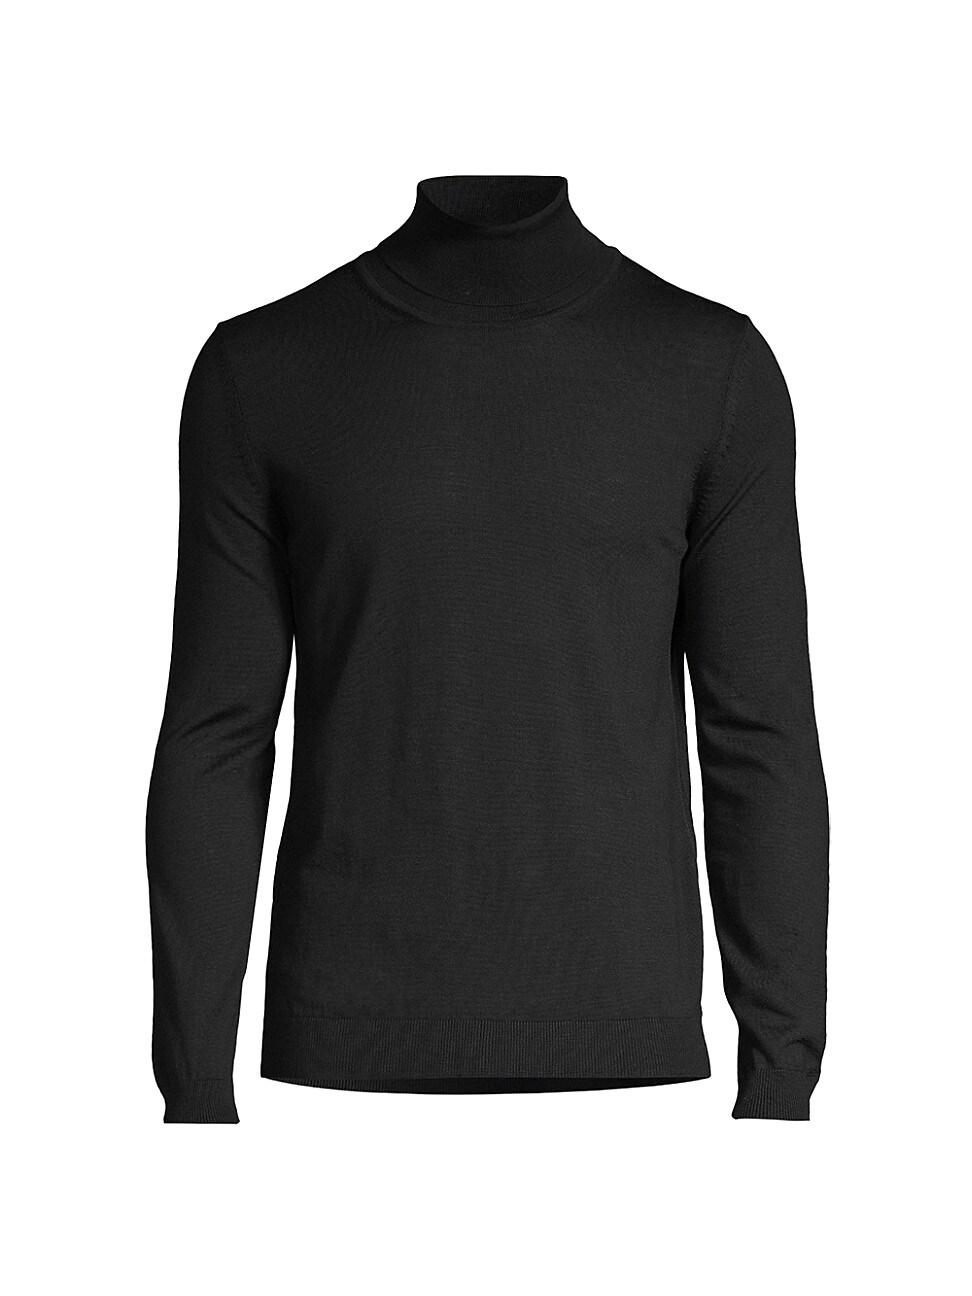 Hugo Boss Men's Musso Virgin Wool Turtleneck Sweater In Black